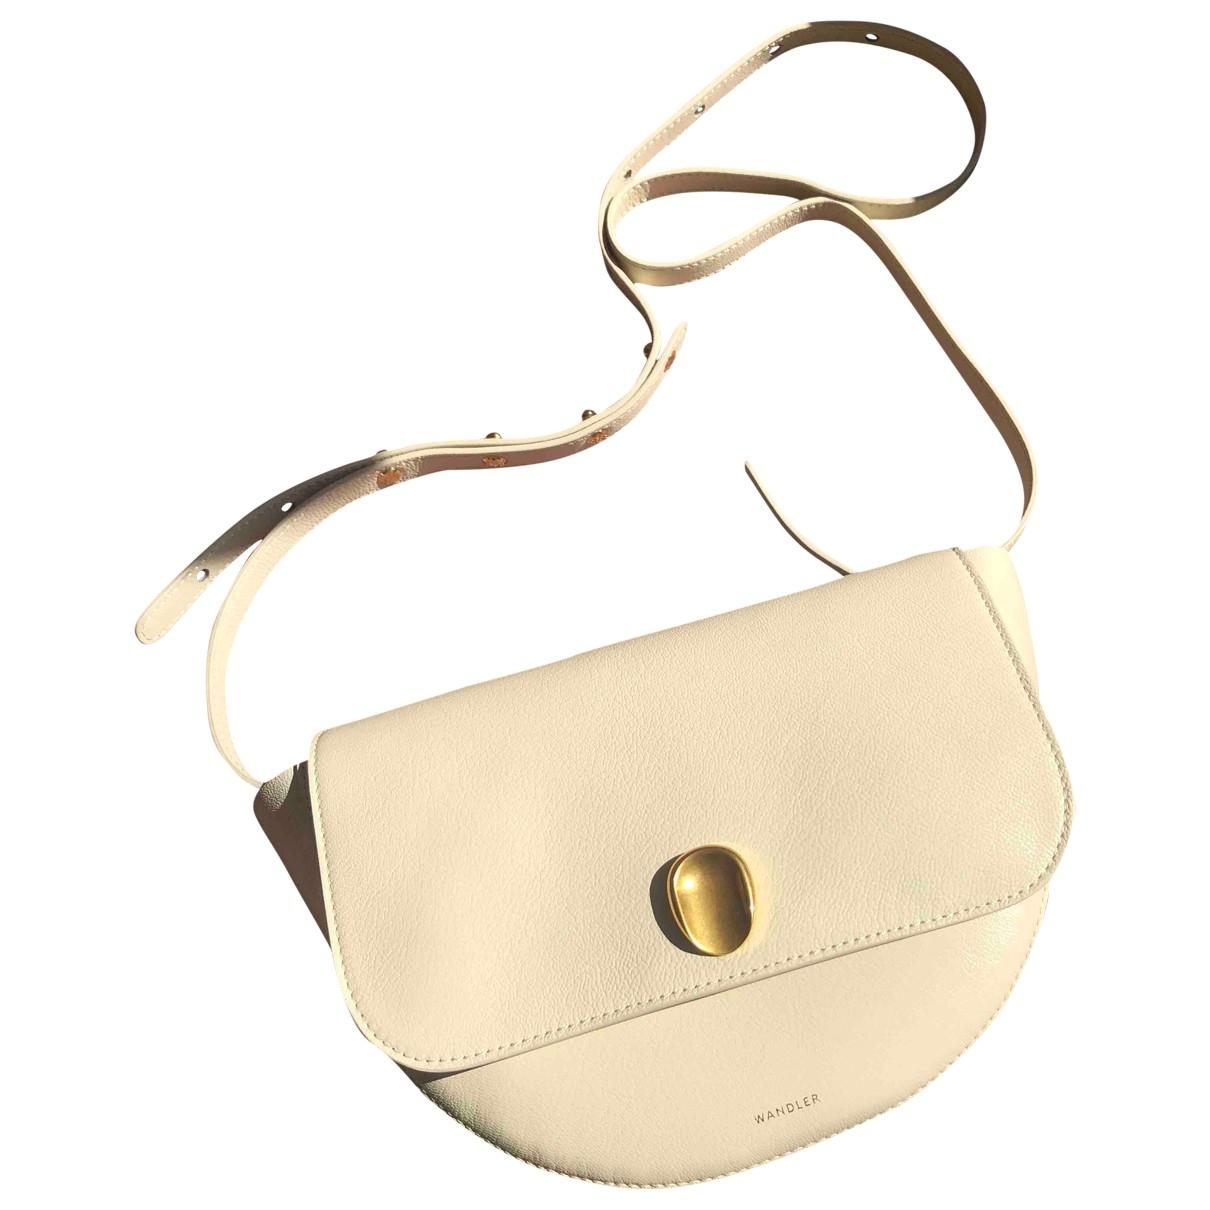 Wandler N Beige Leather handbag for Women N